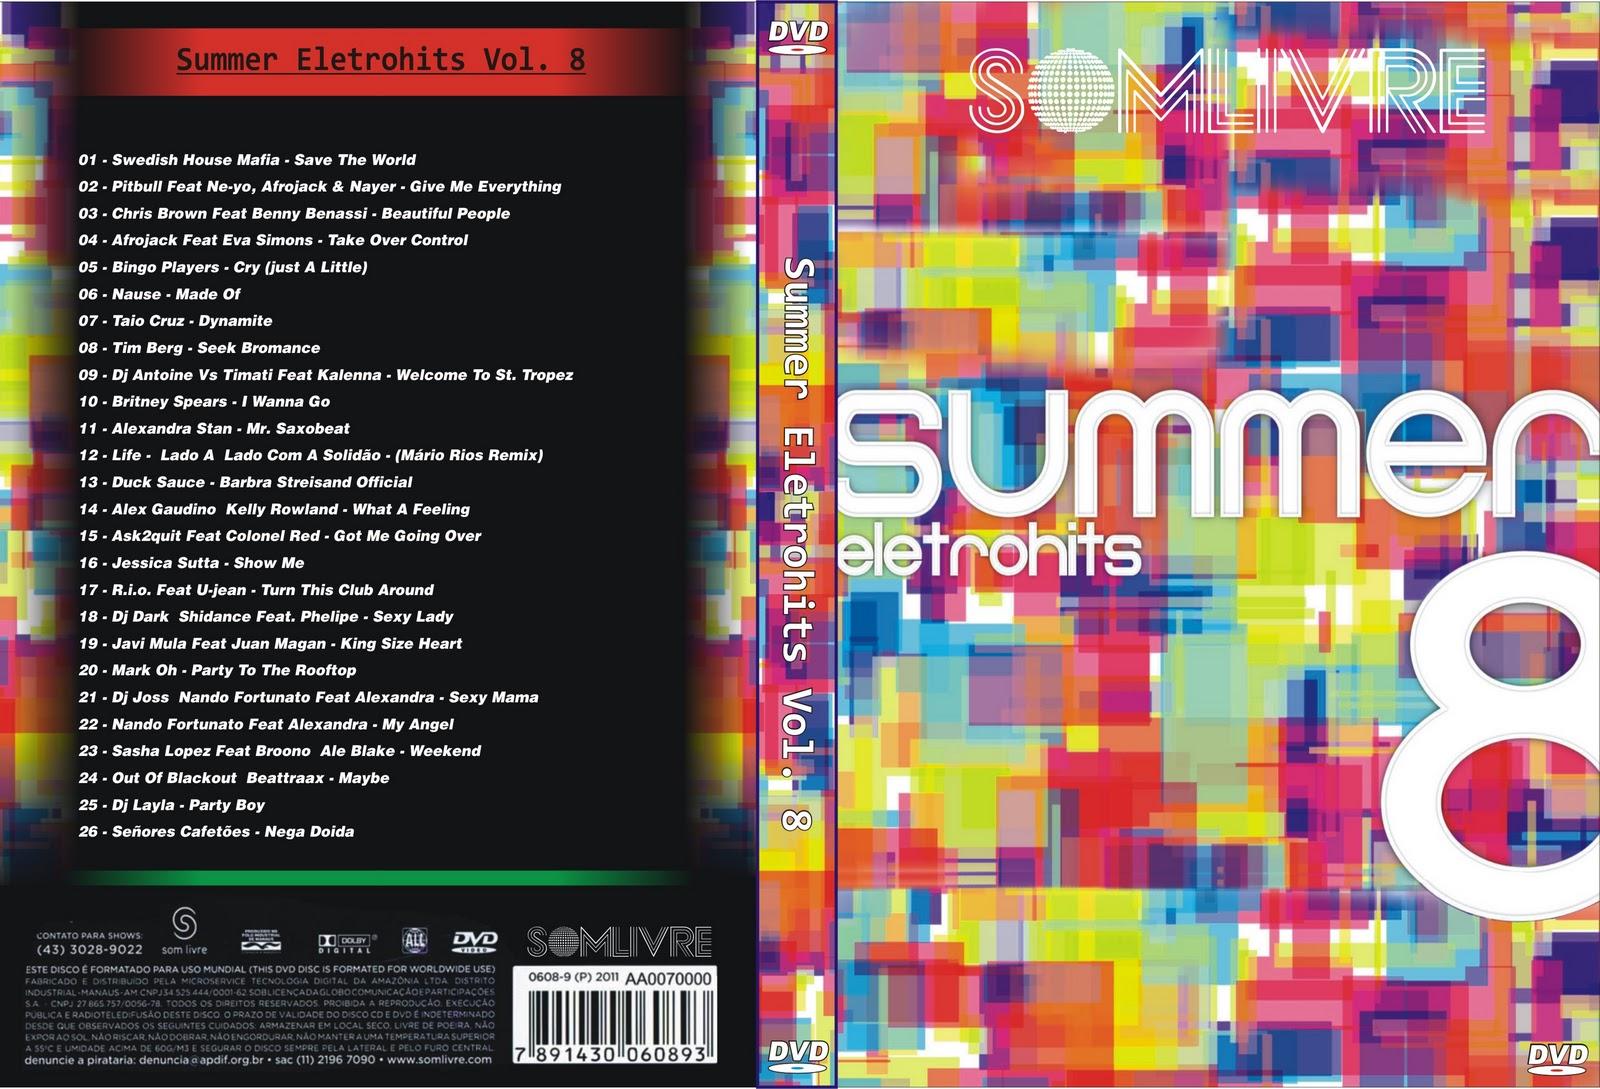 http://1.bp.blogspot.com/-8bqH73x-4zg/TvrYxcuPtpI/AAAAAAAAALk/AmGDOHYcVUo/s1600/DVD+-+SUMMER+ELETROHITS+VOL.+8.jpg